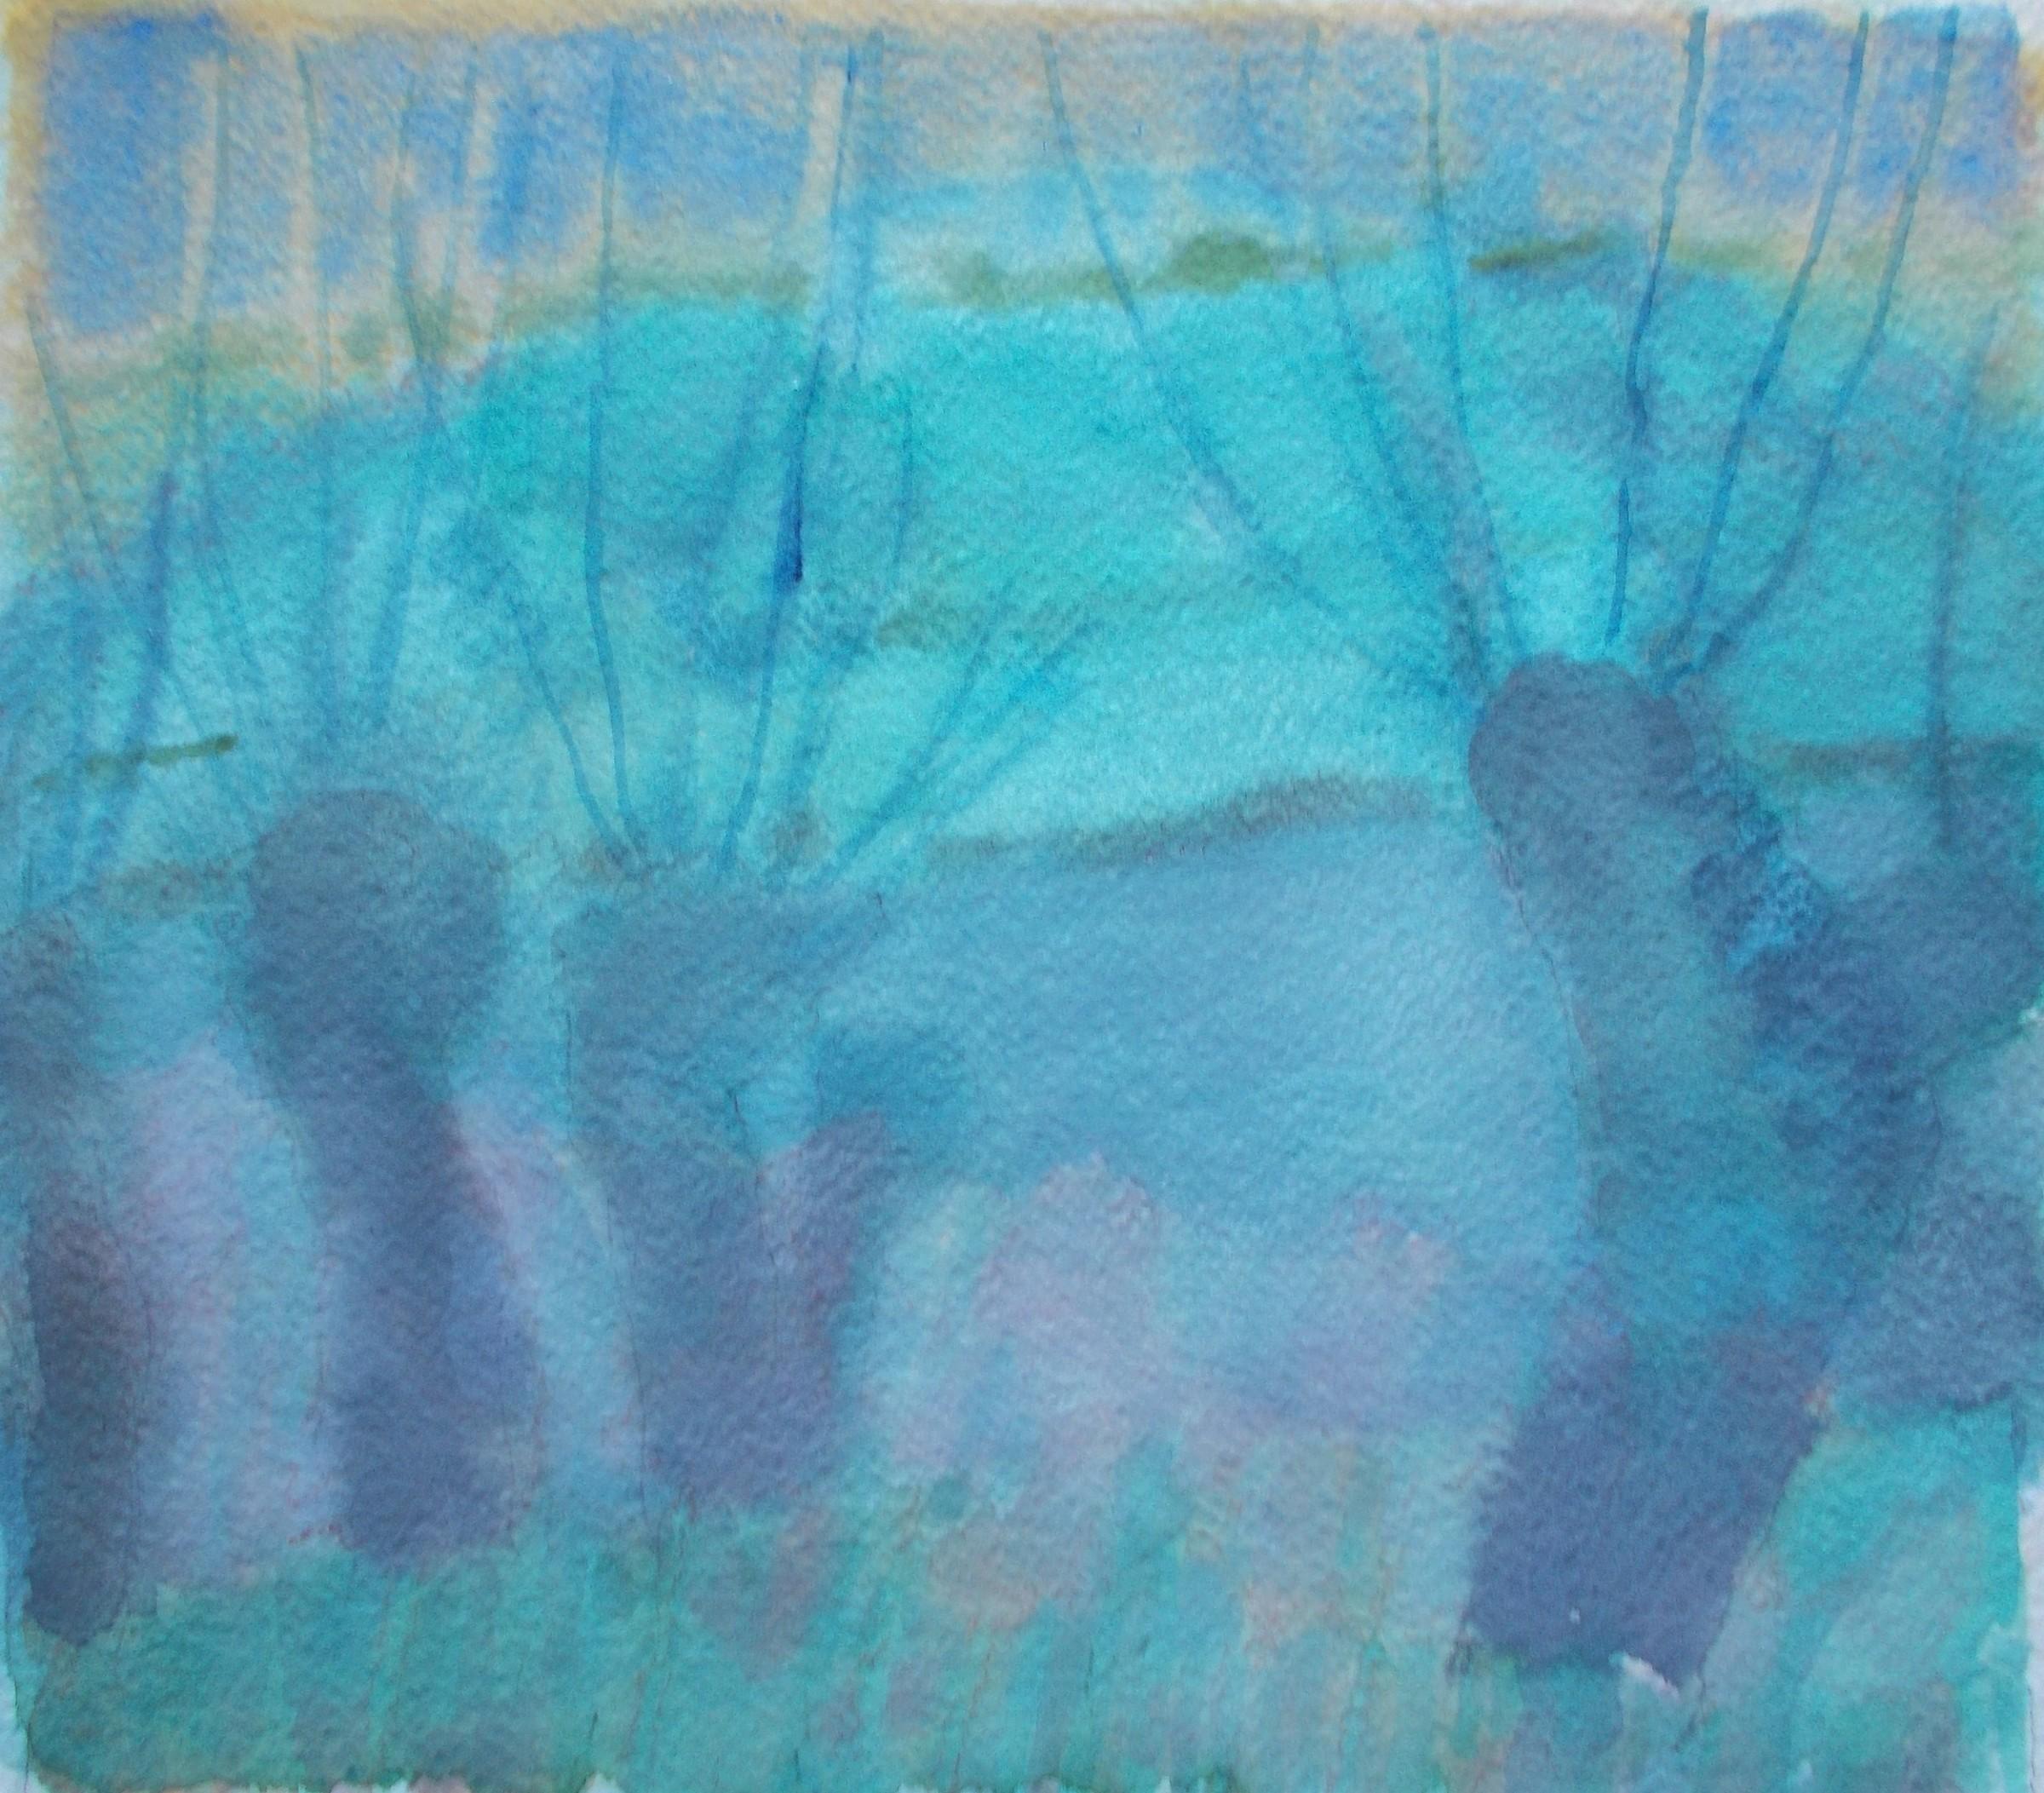 <span class=&#34;link fancybox-details-link&#34;><a href=&#34;/exhibitions/24/works/artworks_standalone10738/&#34;>View Detail Page</a></span><div class=&#34;artist&#34;><span class=&#34;artist&#34;><strong>Anne Marlow</strong></span></div><div class=&#34;title&#34;><em>Willows</em></div><div class=&#34;medium&#34;>watercolour & pastel</div><div class=&#34;dimensions&#34;>46x45cm</div>